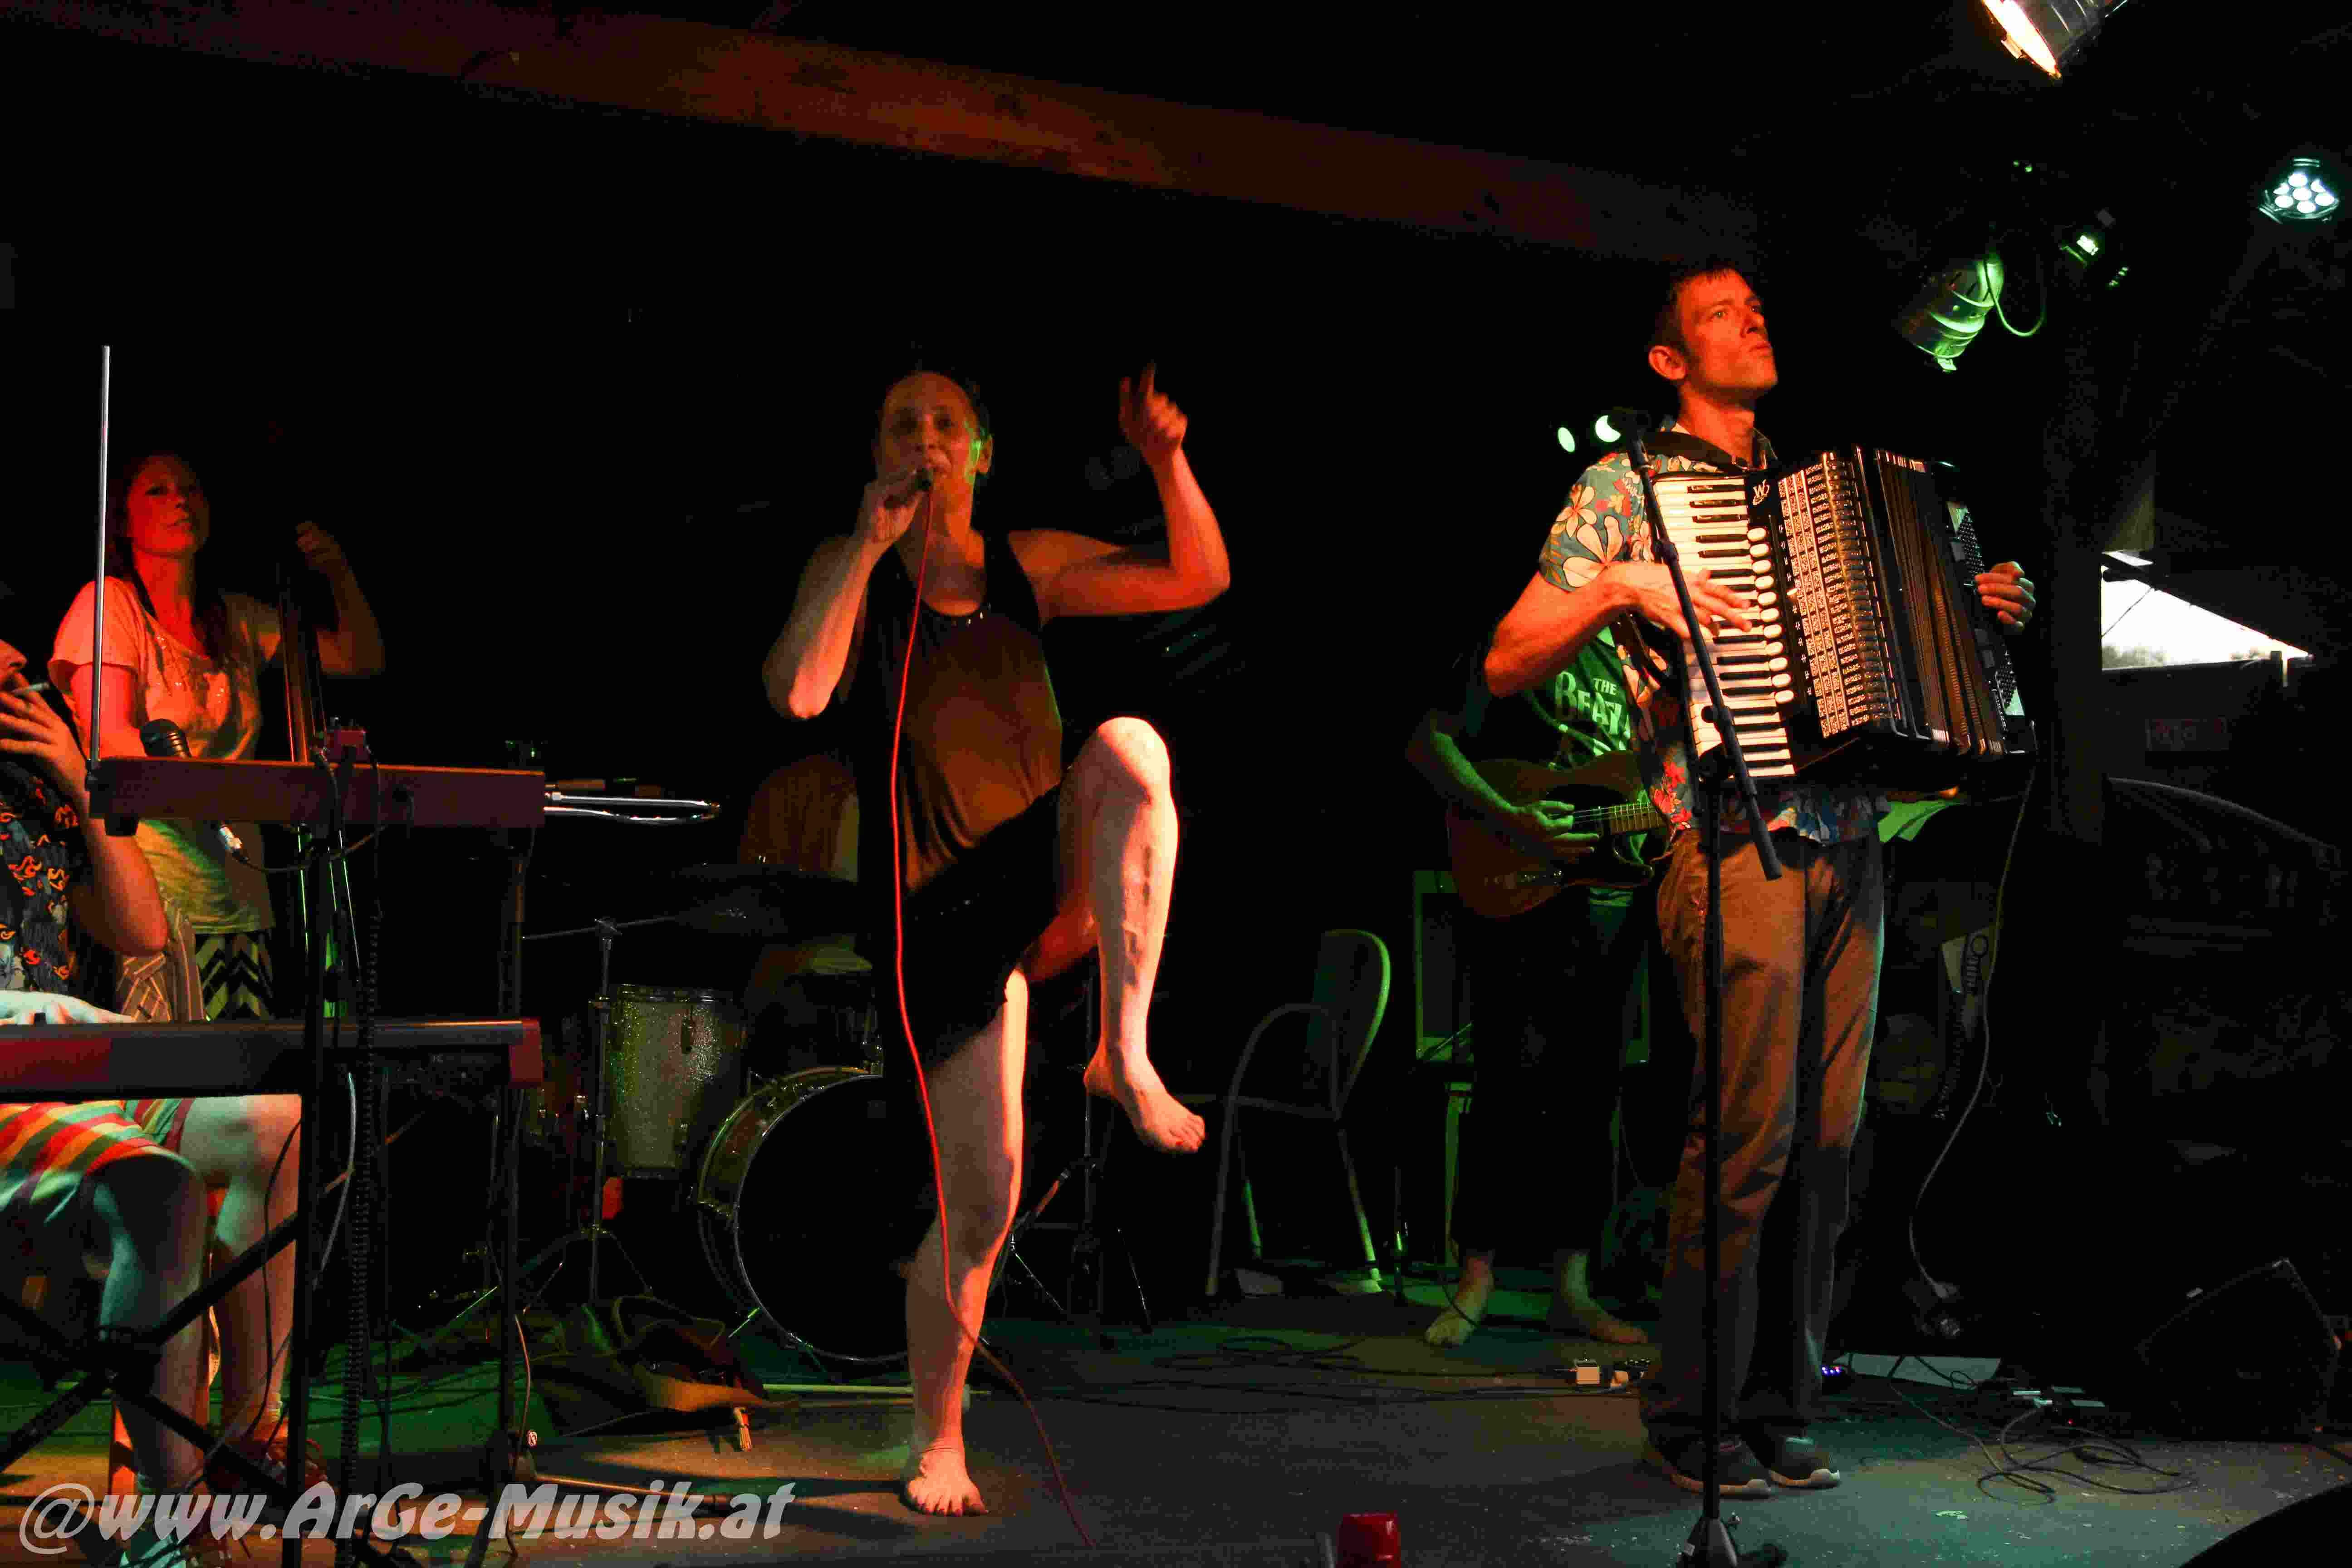 Tini Trampler, Playbackdolls, Das Dreckige Orchestra